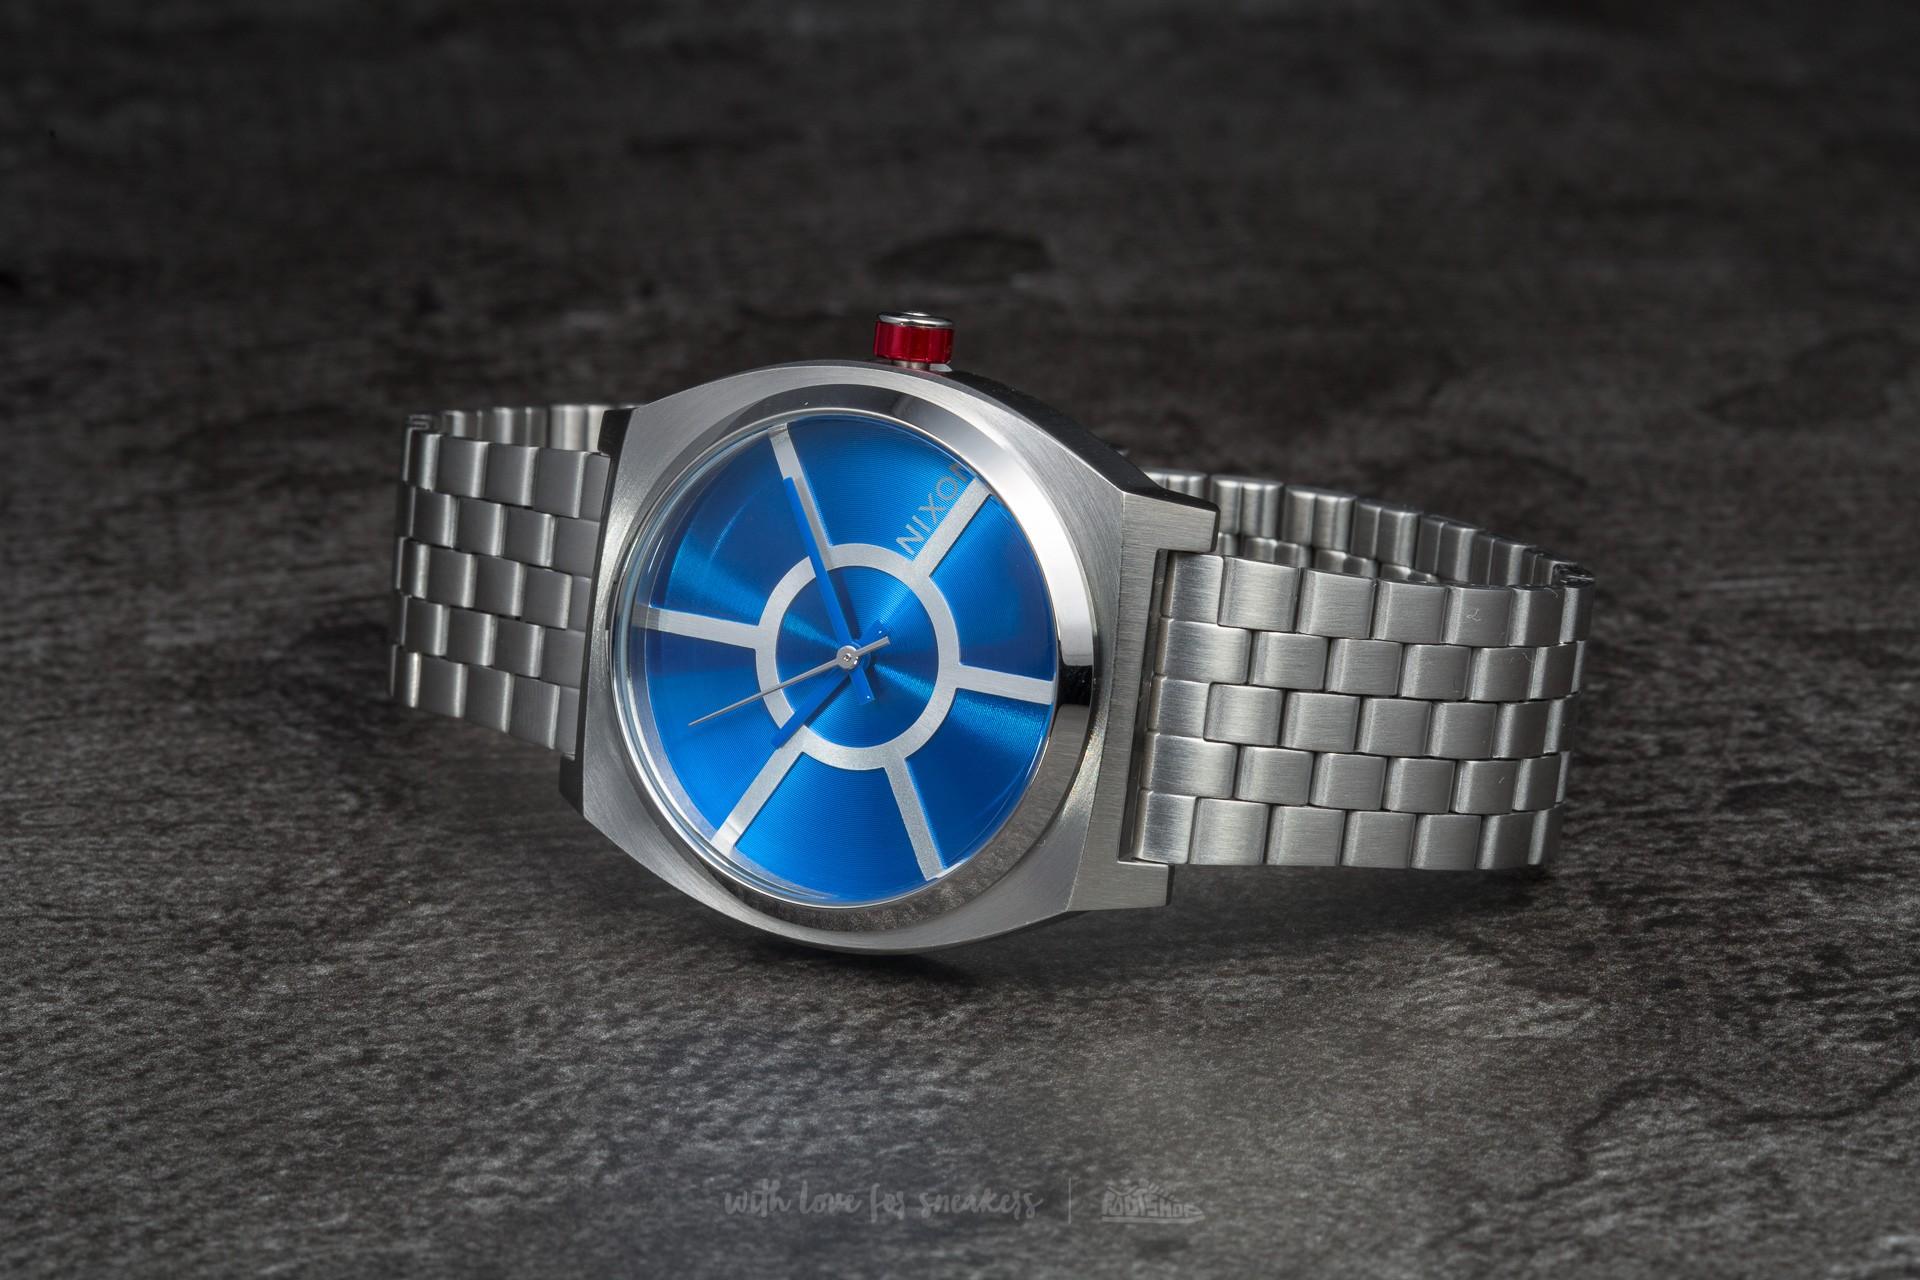 Nixon TIME TELLER SW R2D2 BLUE